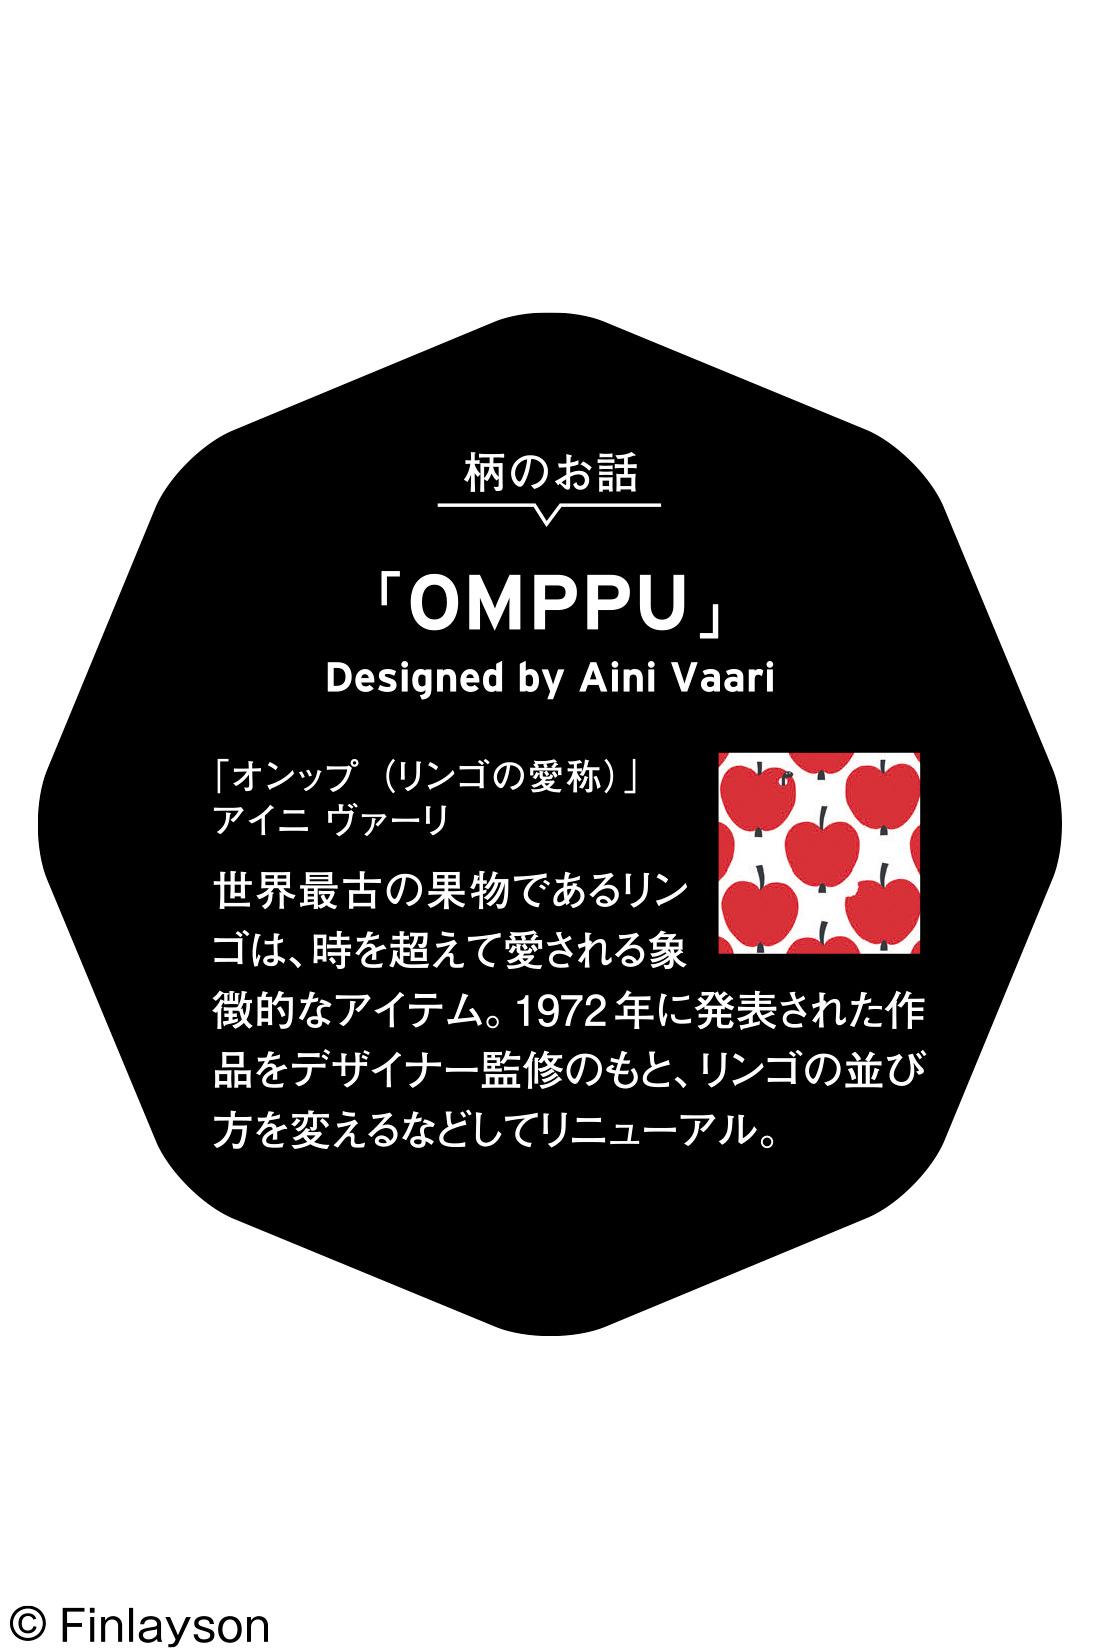 〈OMPPU〉オンップ 世界最古の果物であるリンゴは、時を超えて愛される象徴的なアイテム。1972年に発表された作品をデザイナー監修のもと、リンゴの並び方を変えるなどしてリニューアル。